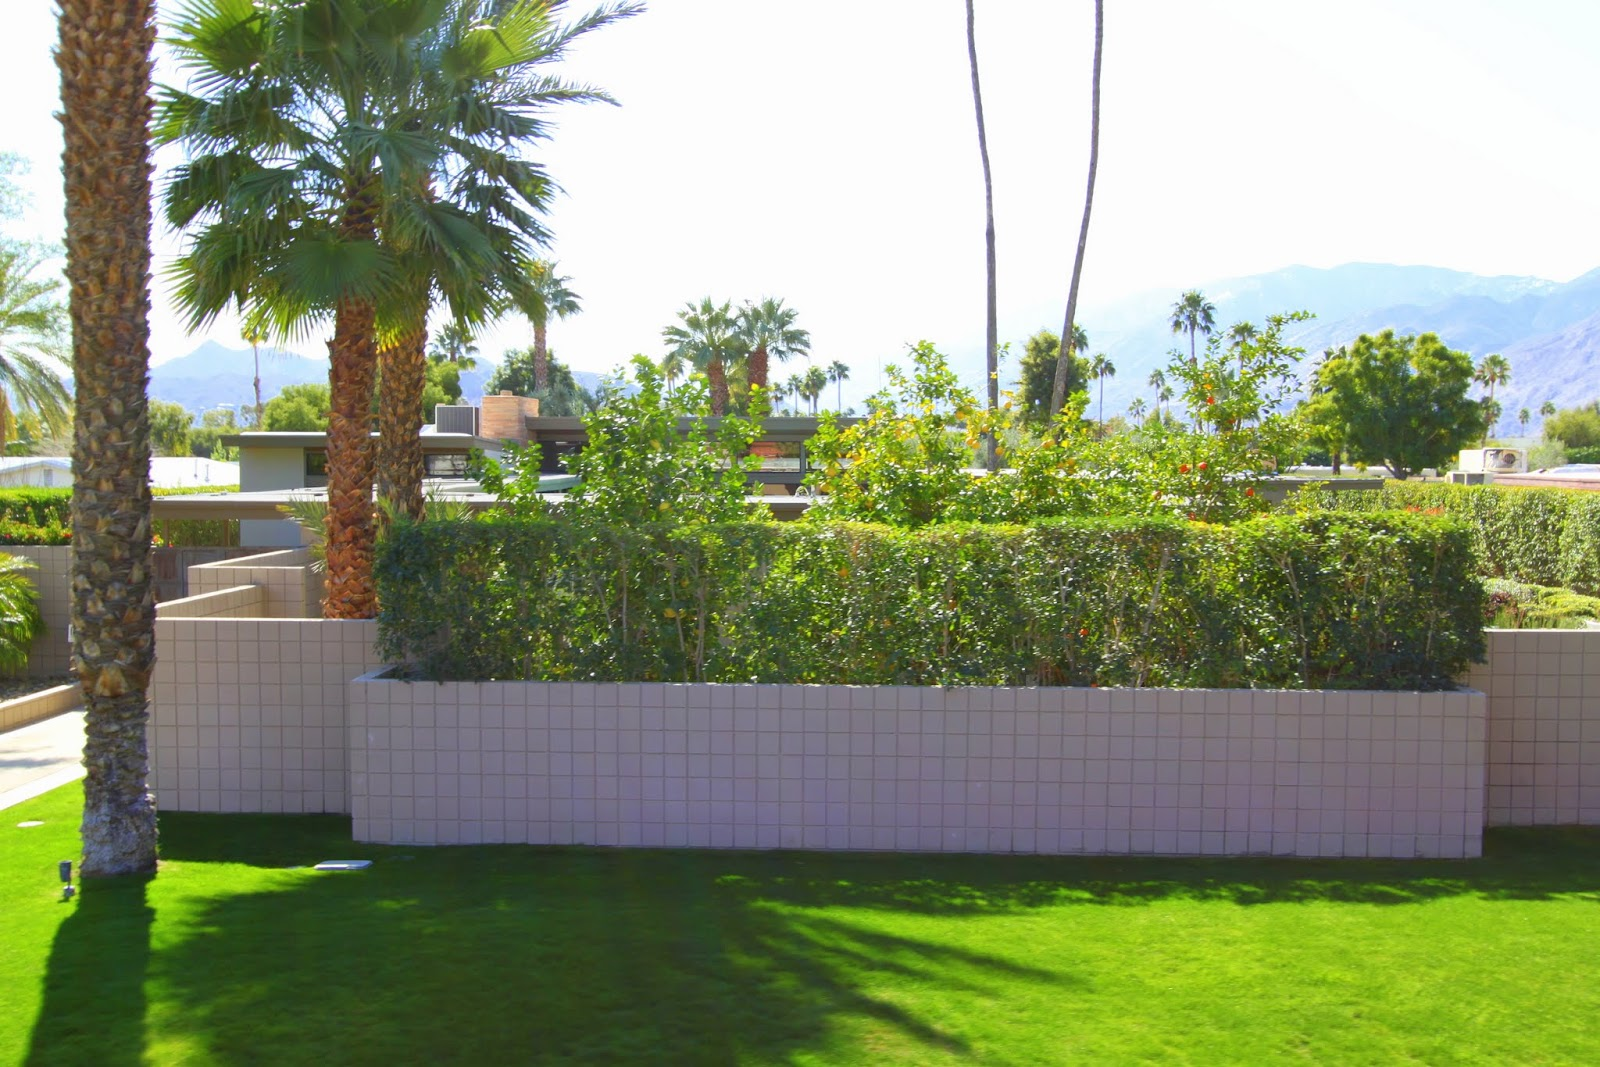 psmw palm springs modernism week the hedge tour mid century modern remodel. Black Bedroom Furniture Sets. Home Design Ideas